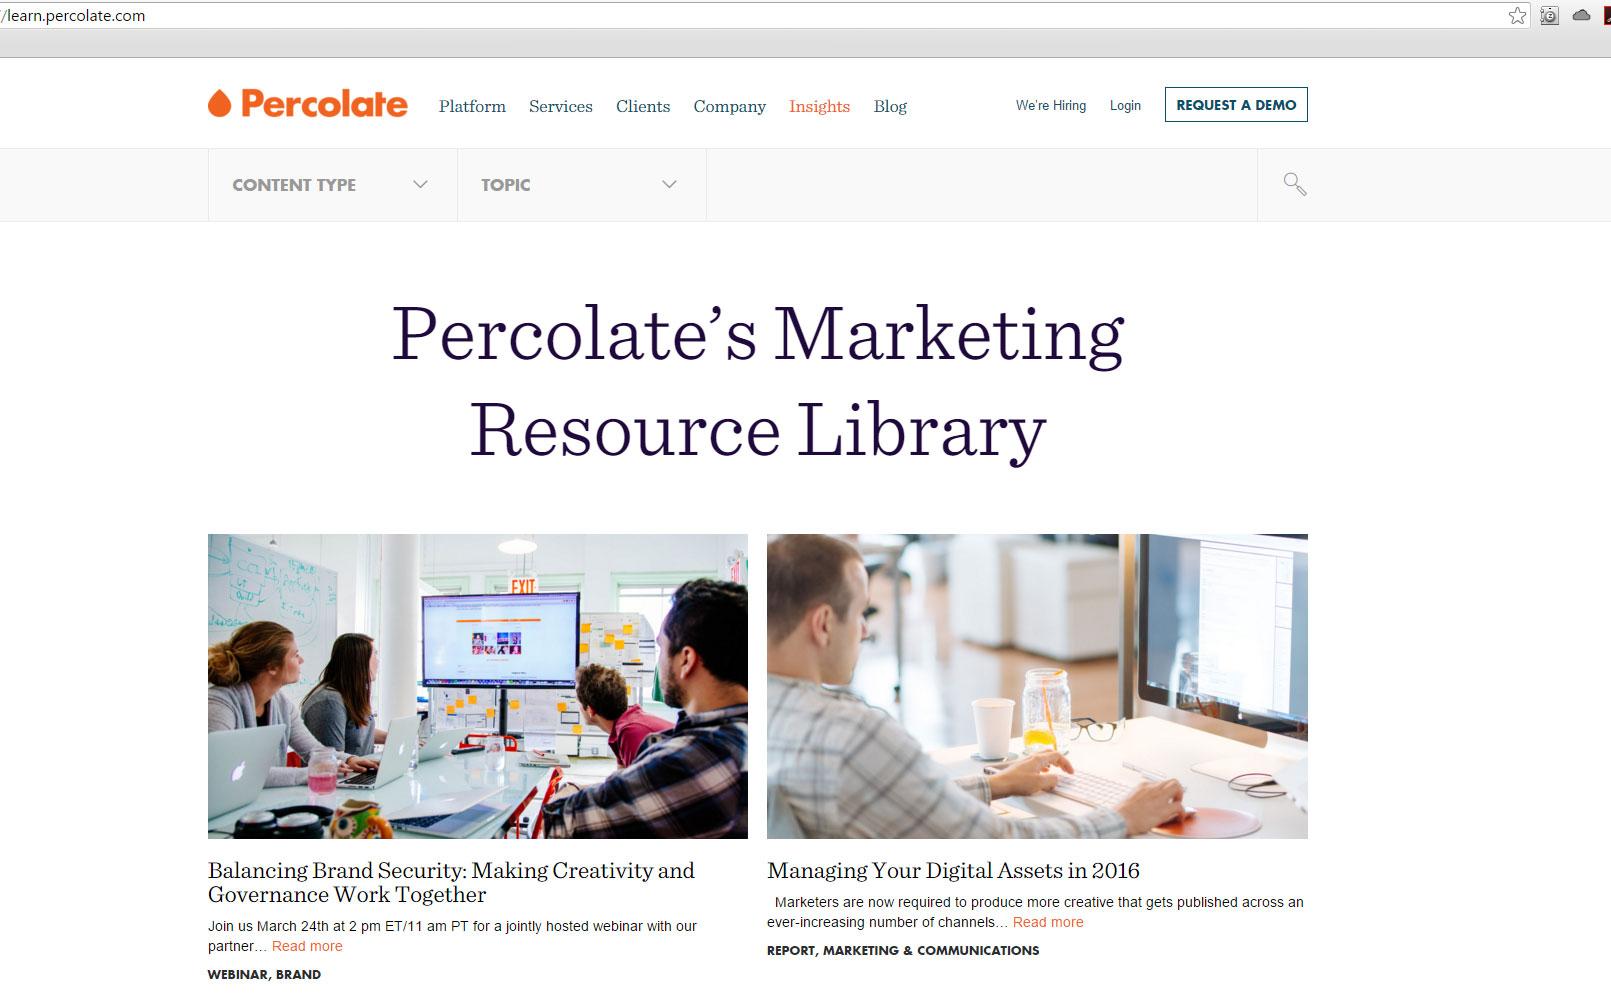 blog design of Percolate website